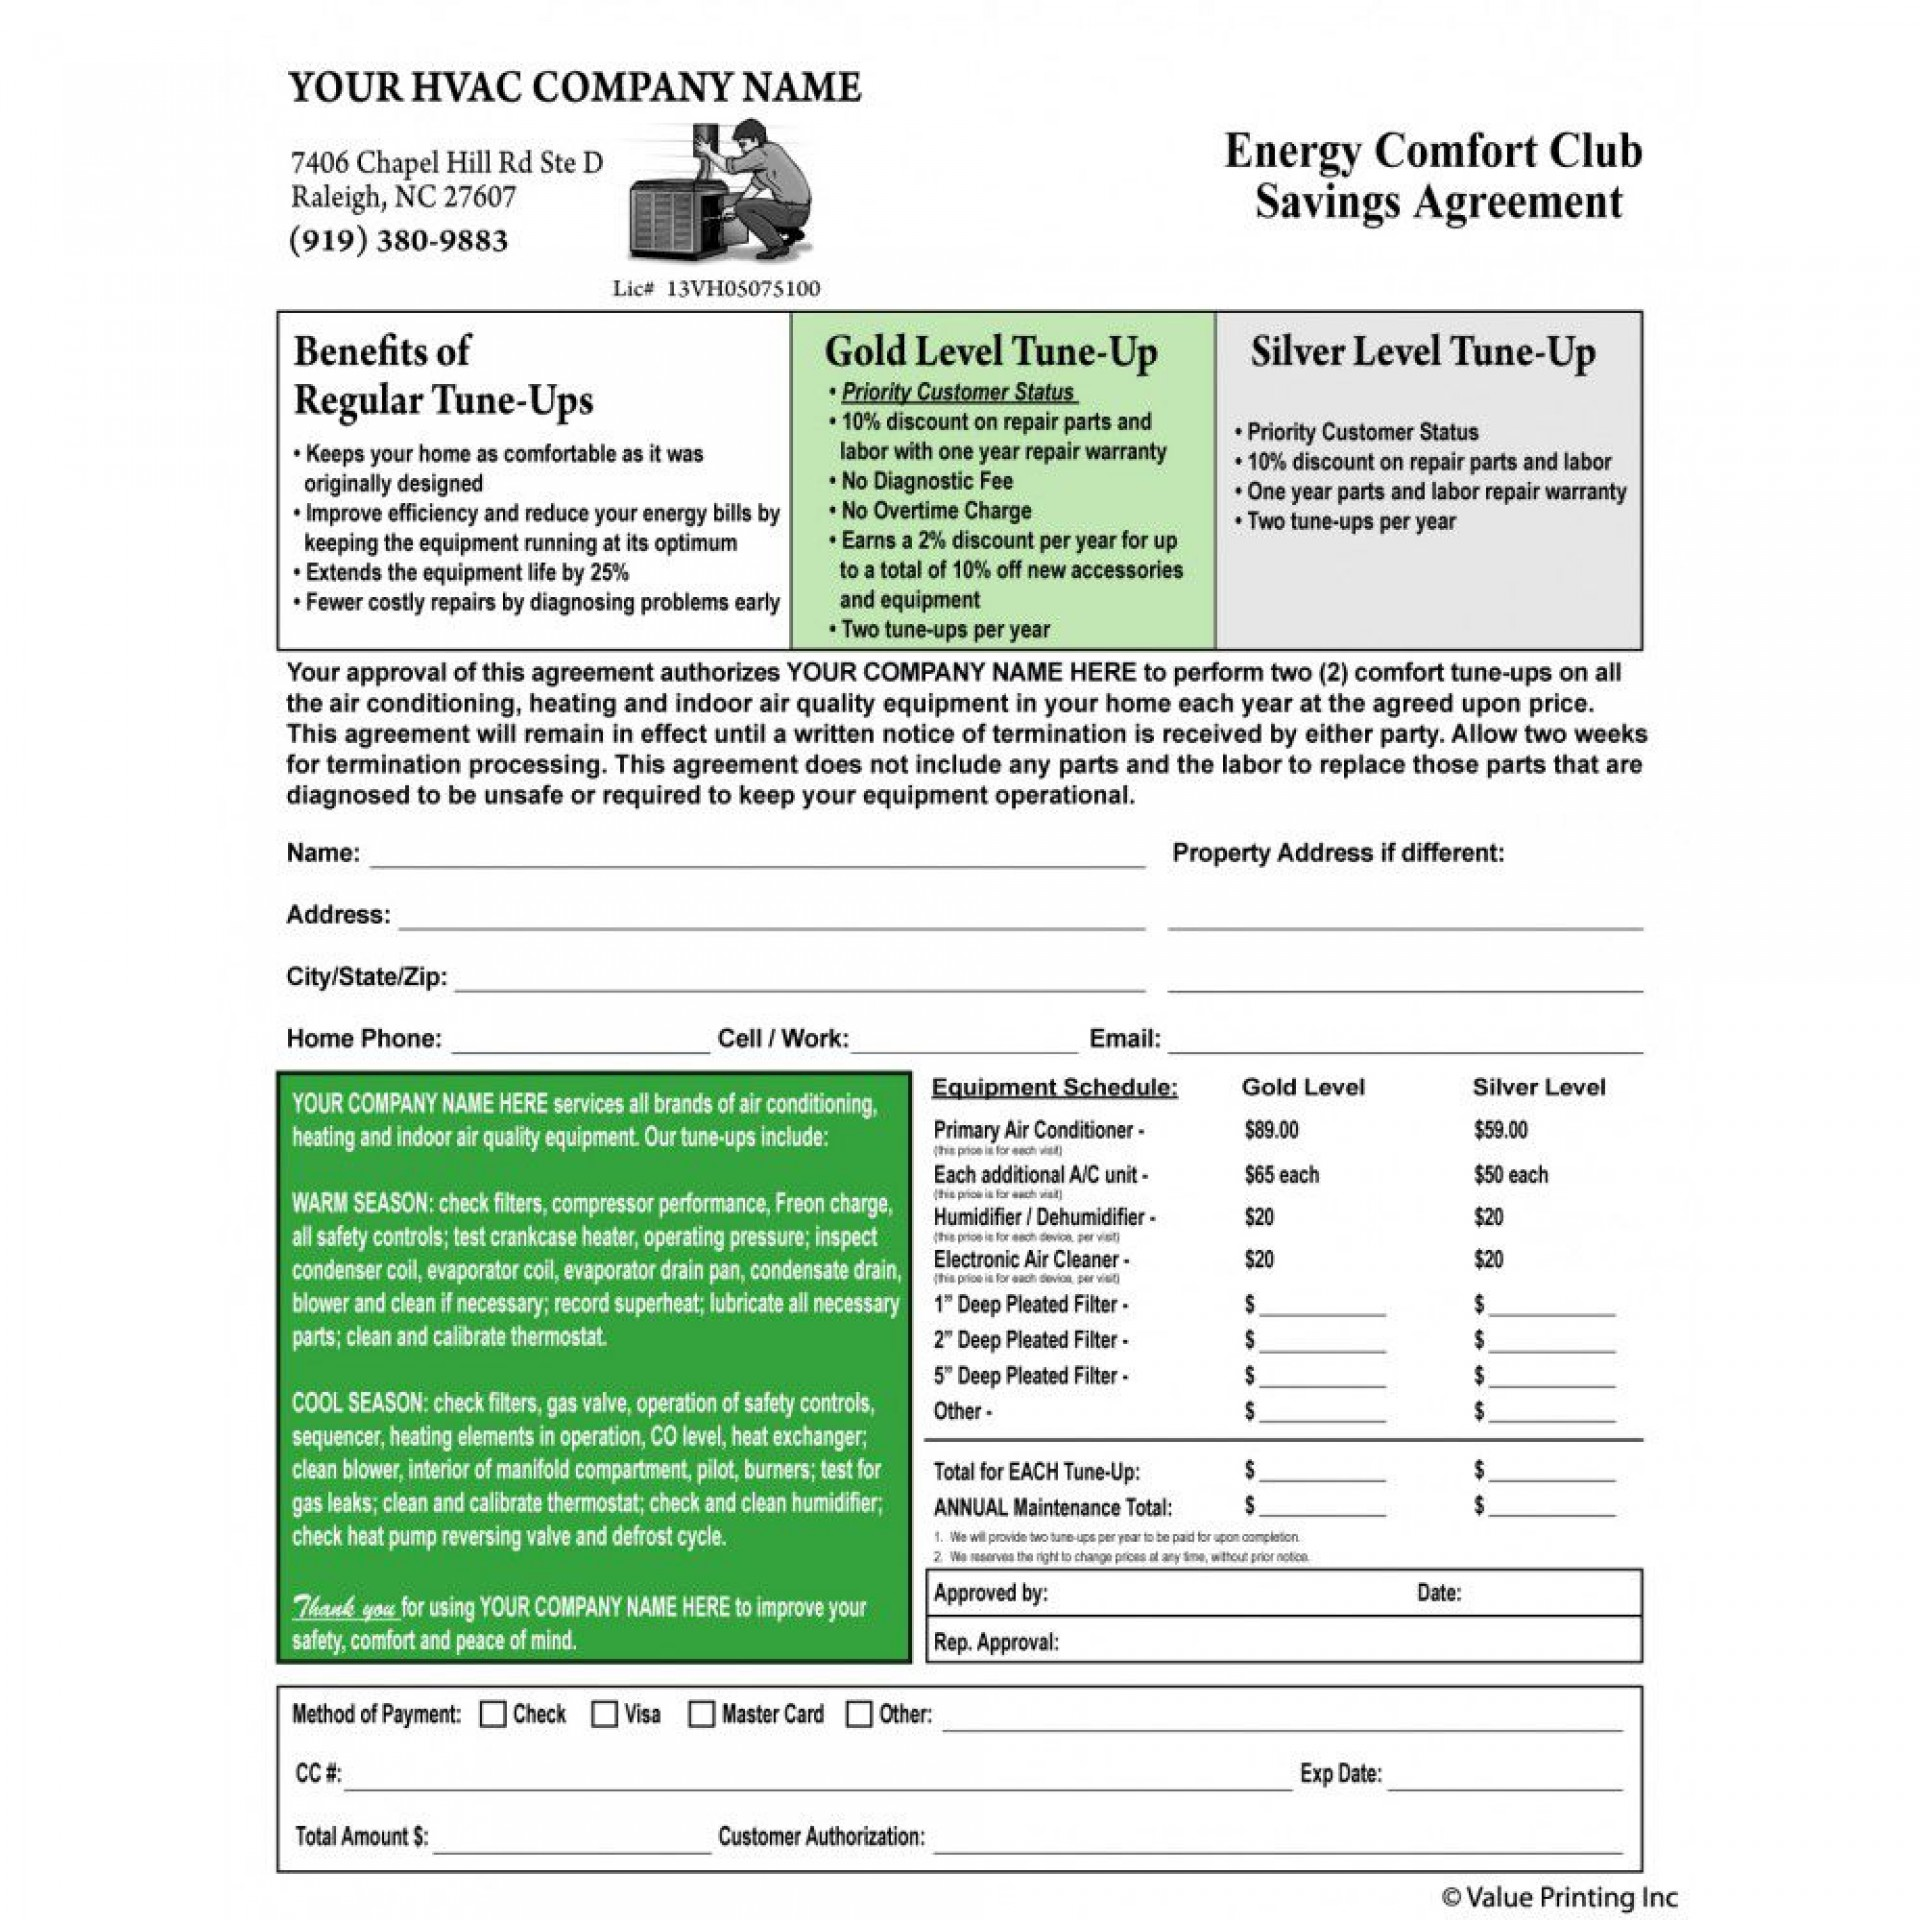 006 Wonderful Hvac Service Agreement Template Concept  Contract Form Maintenance Pdf1920